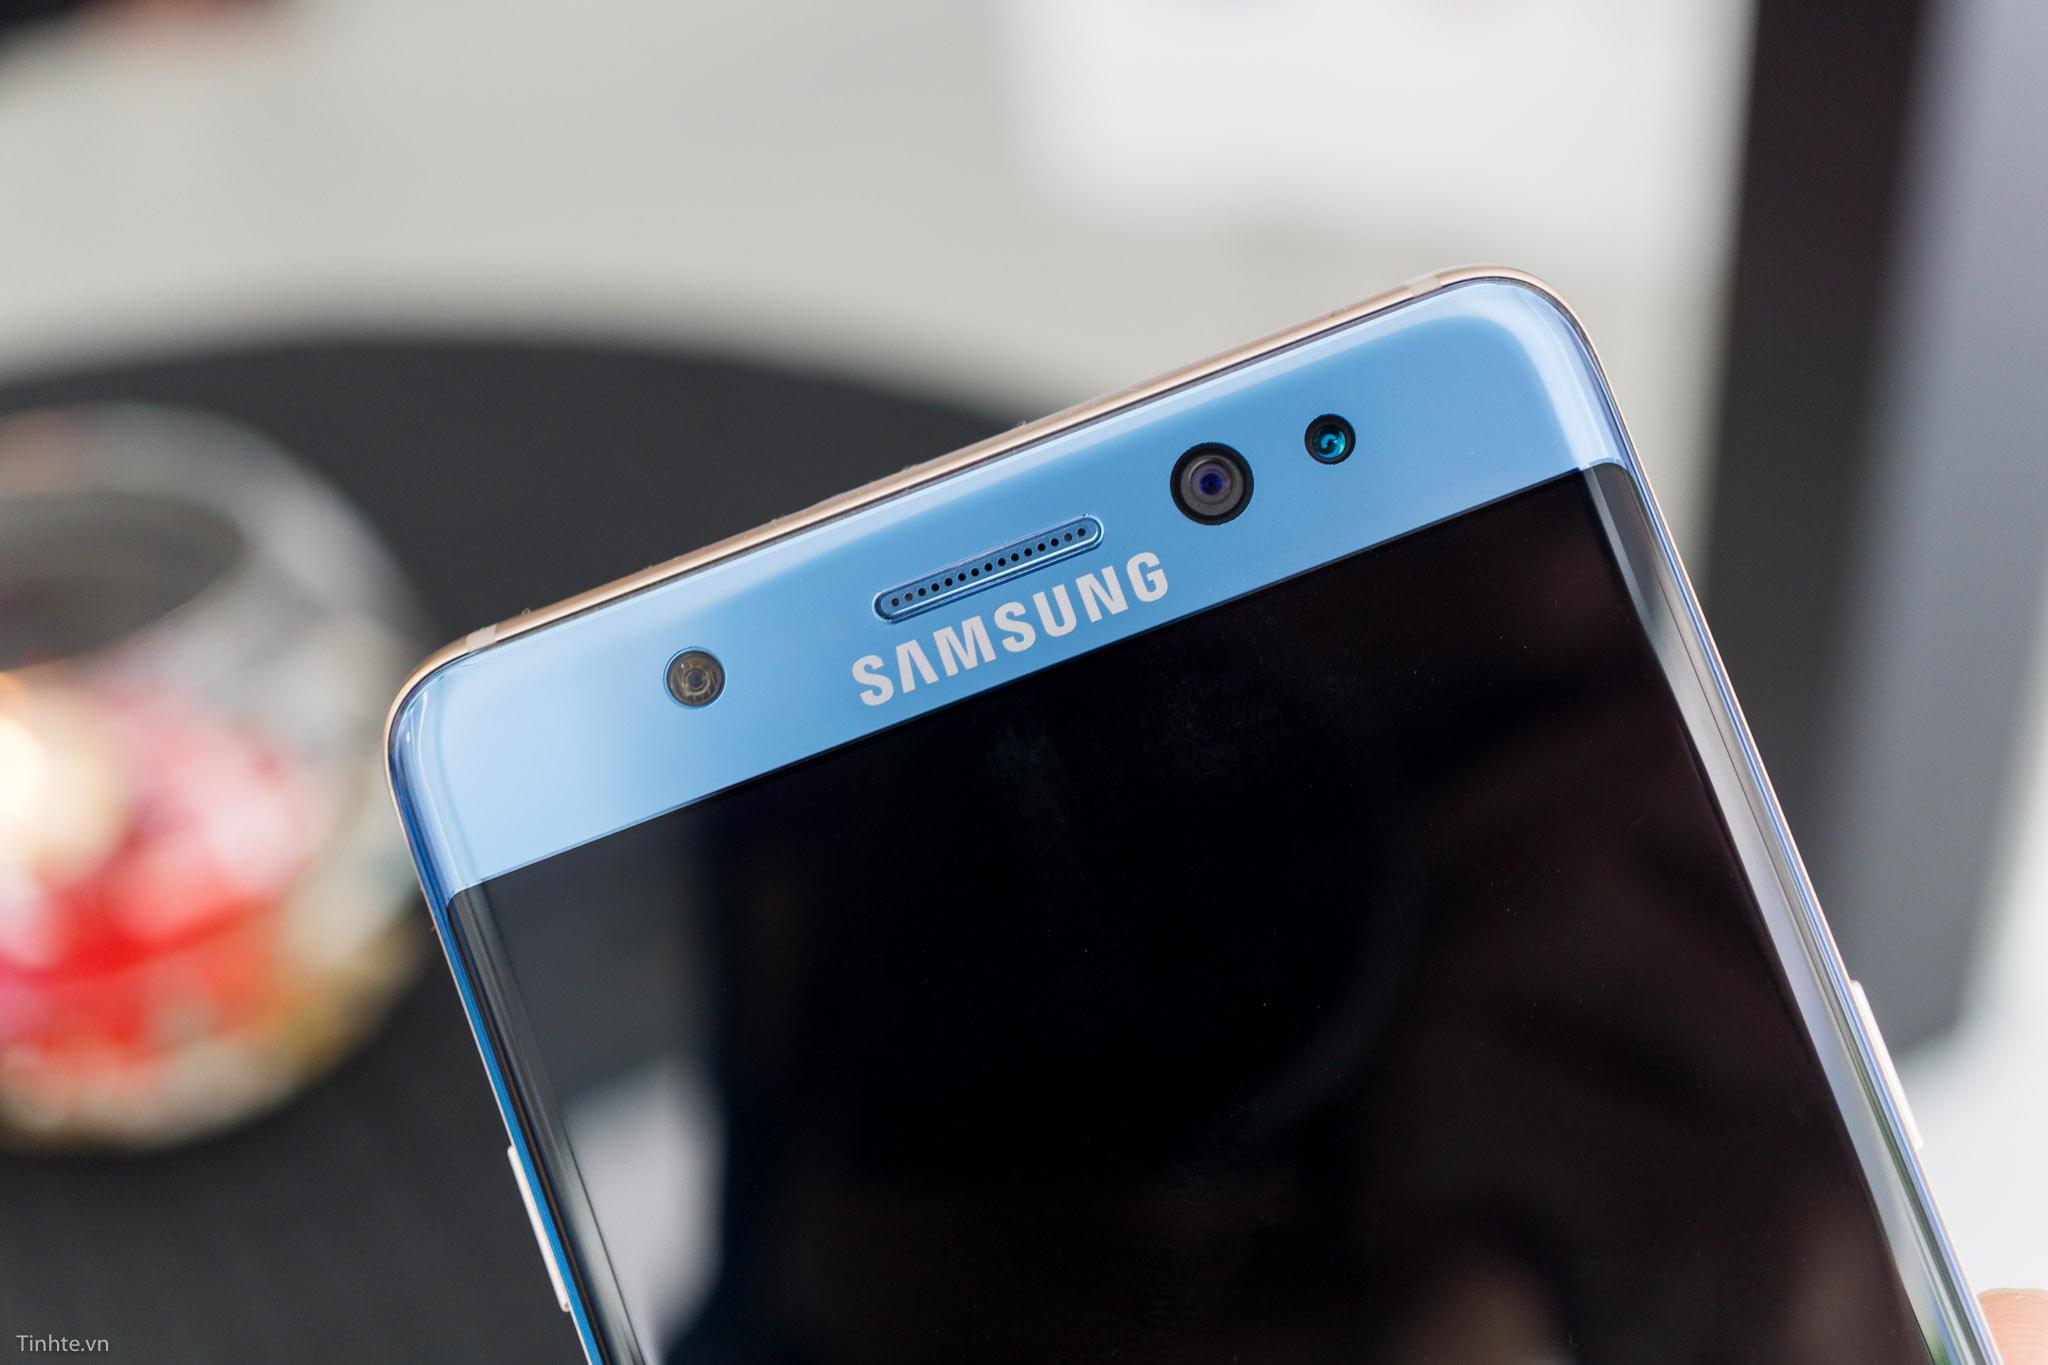 Samsung_khong_hoi_sinh_Galaxy_Note_7_tinhte_2.jpg